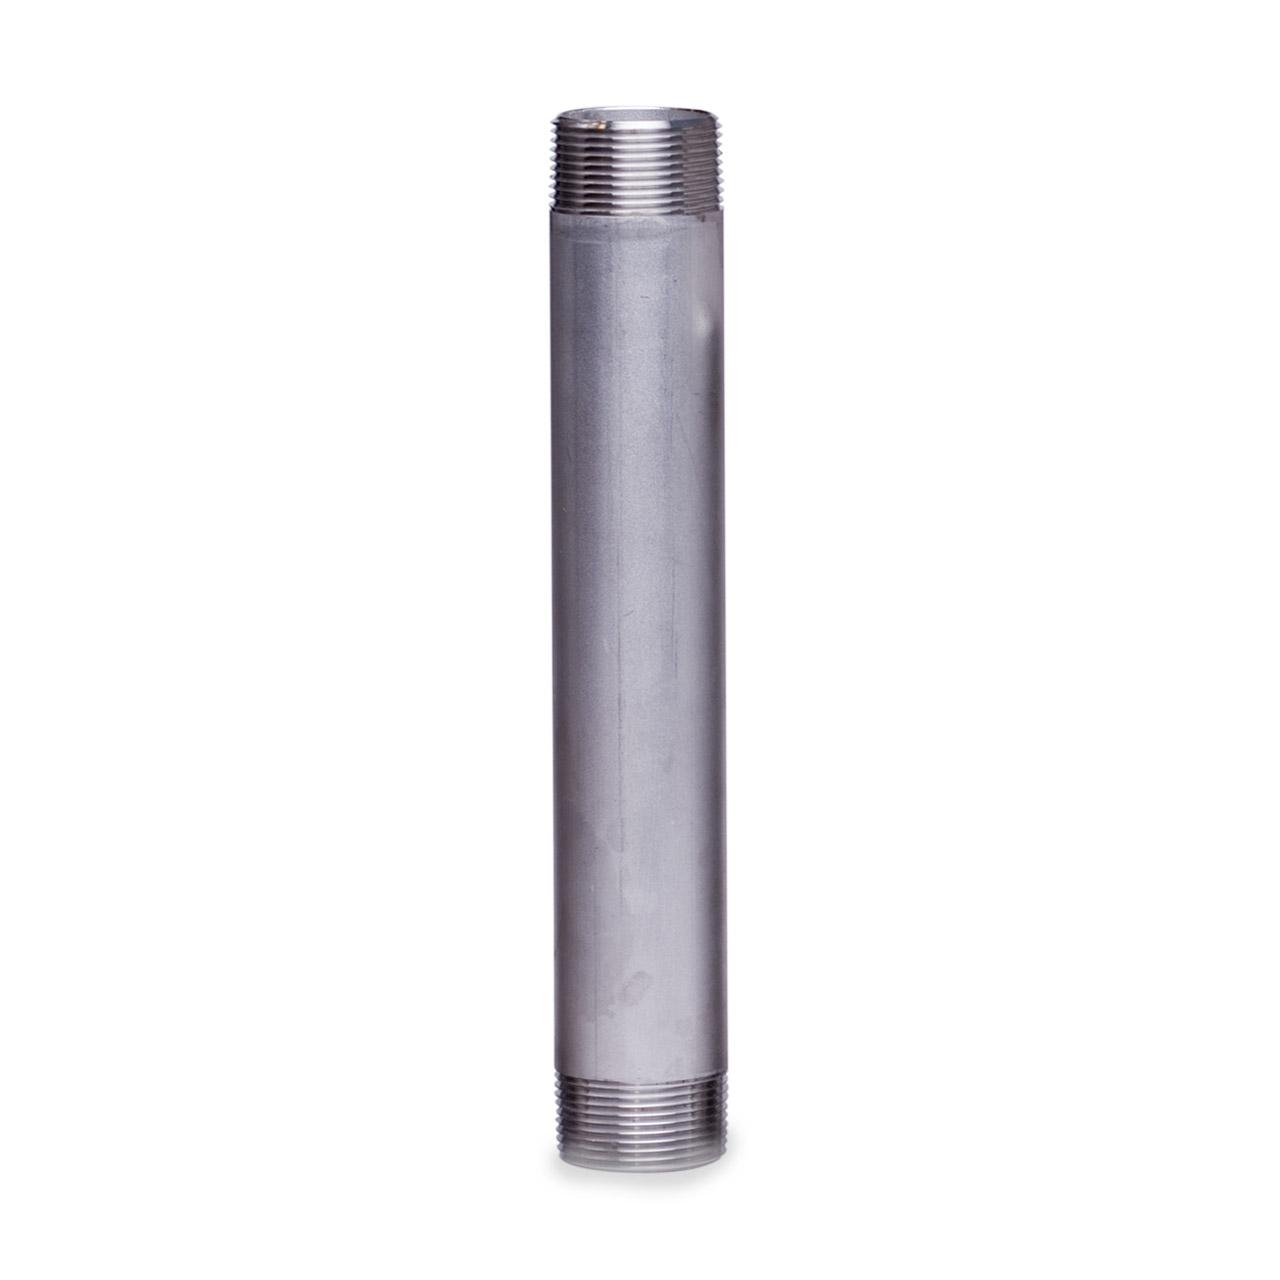 Schedule stainless steel pipe nipple